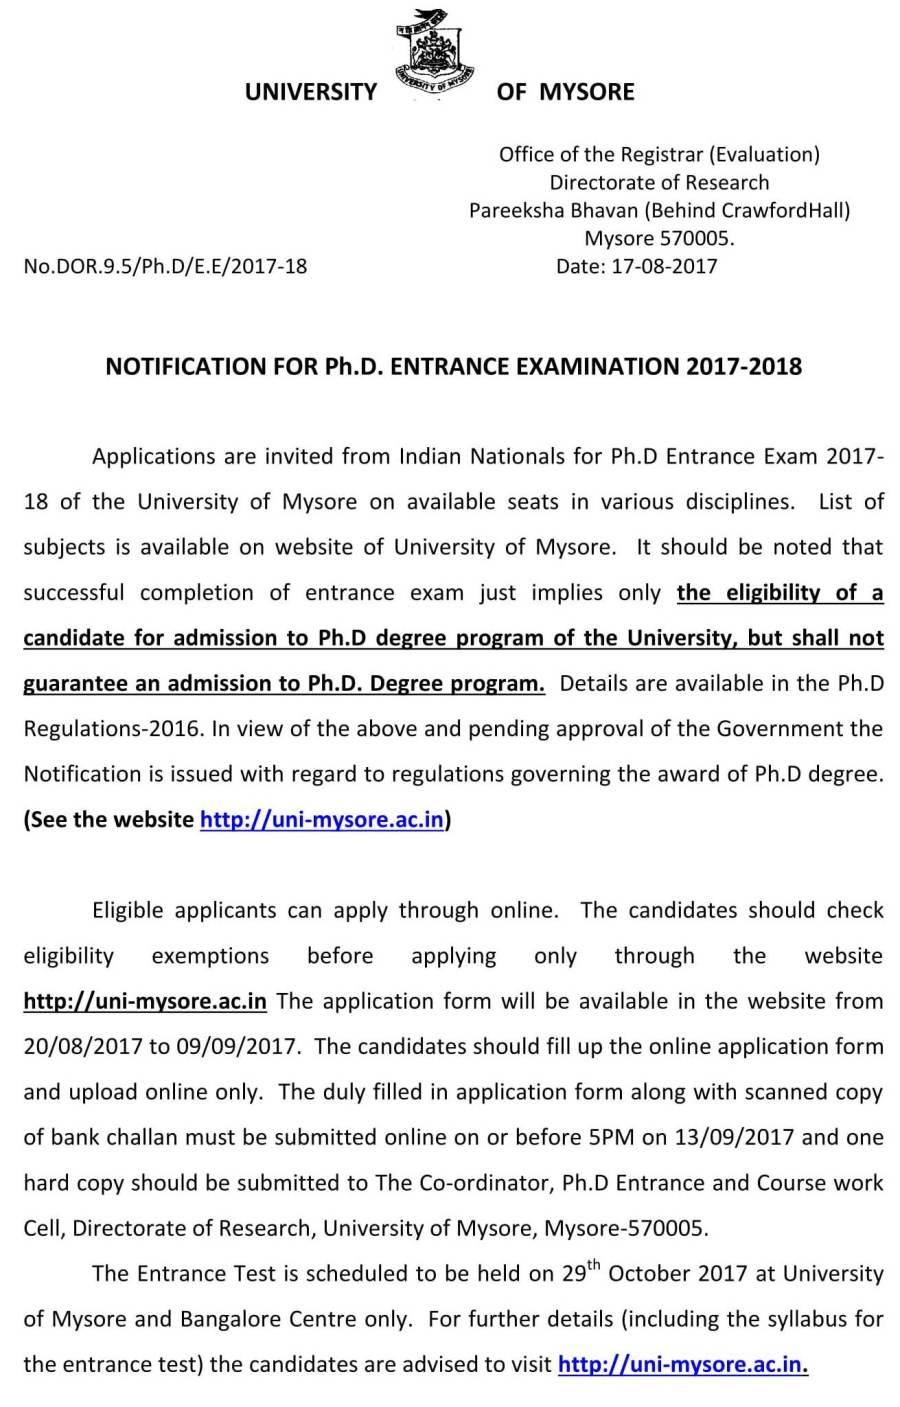 ph.d_notification_2017-18-1.jpg